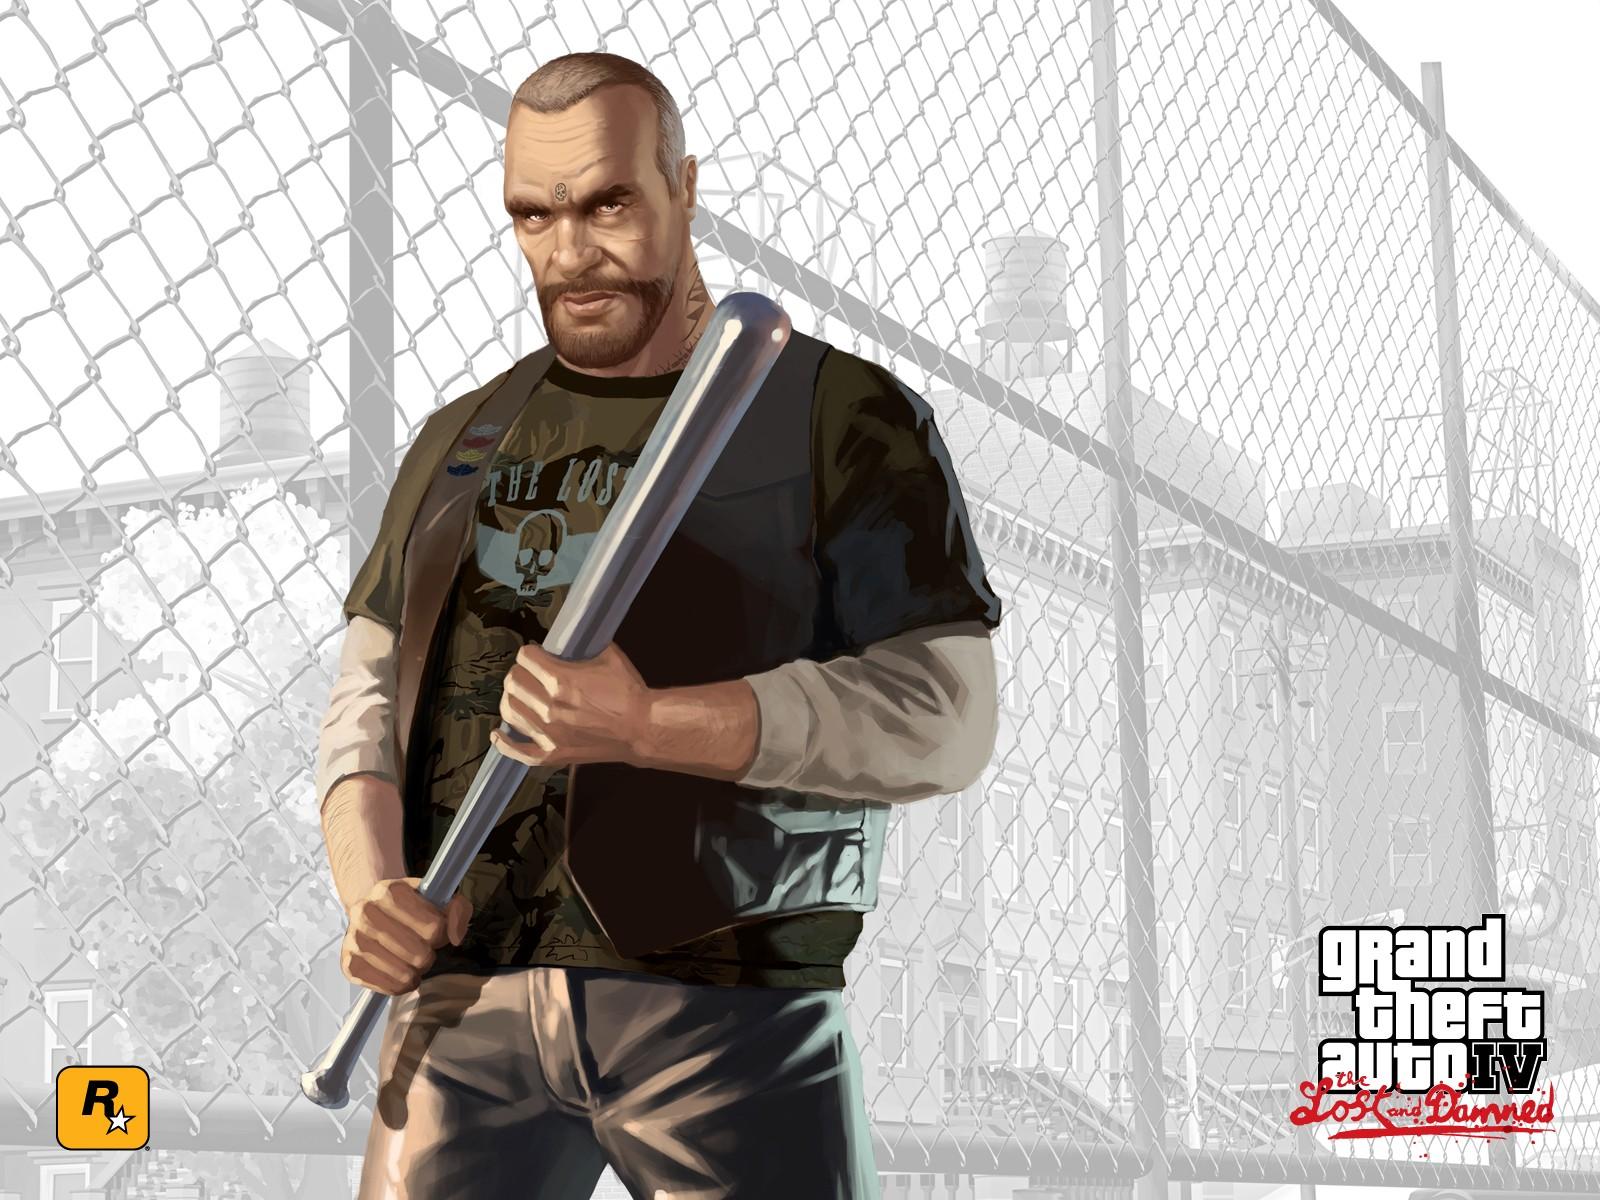 Wallpaper : video games, Rockstar Games, Grand Theft Auto The Lost